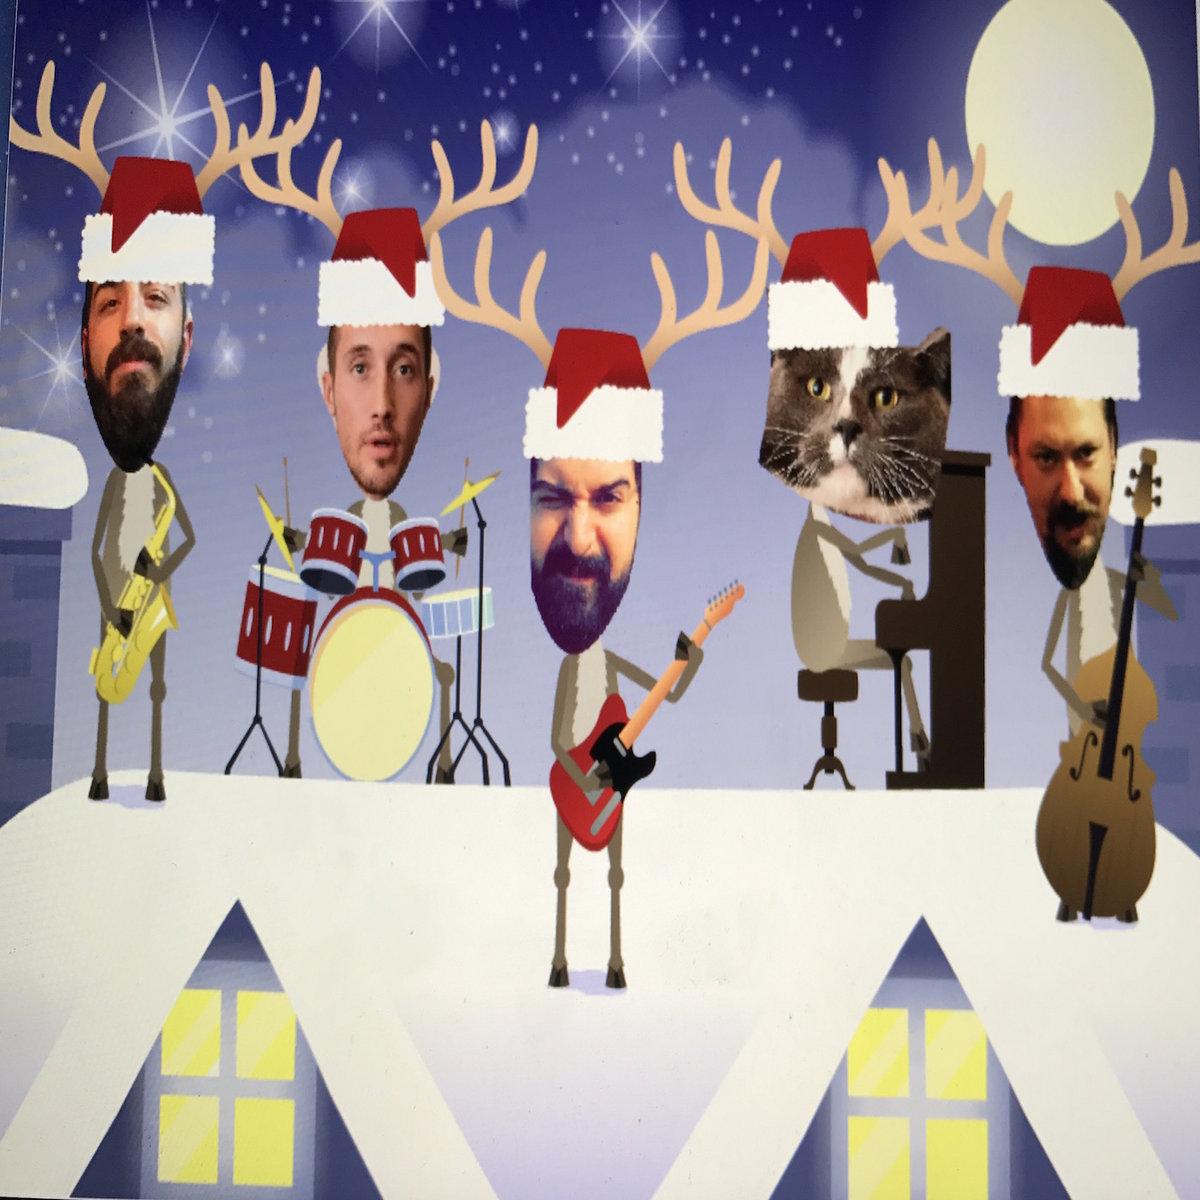 Wham Christmas.Last Christmas Wham Cover Ate Bit